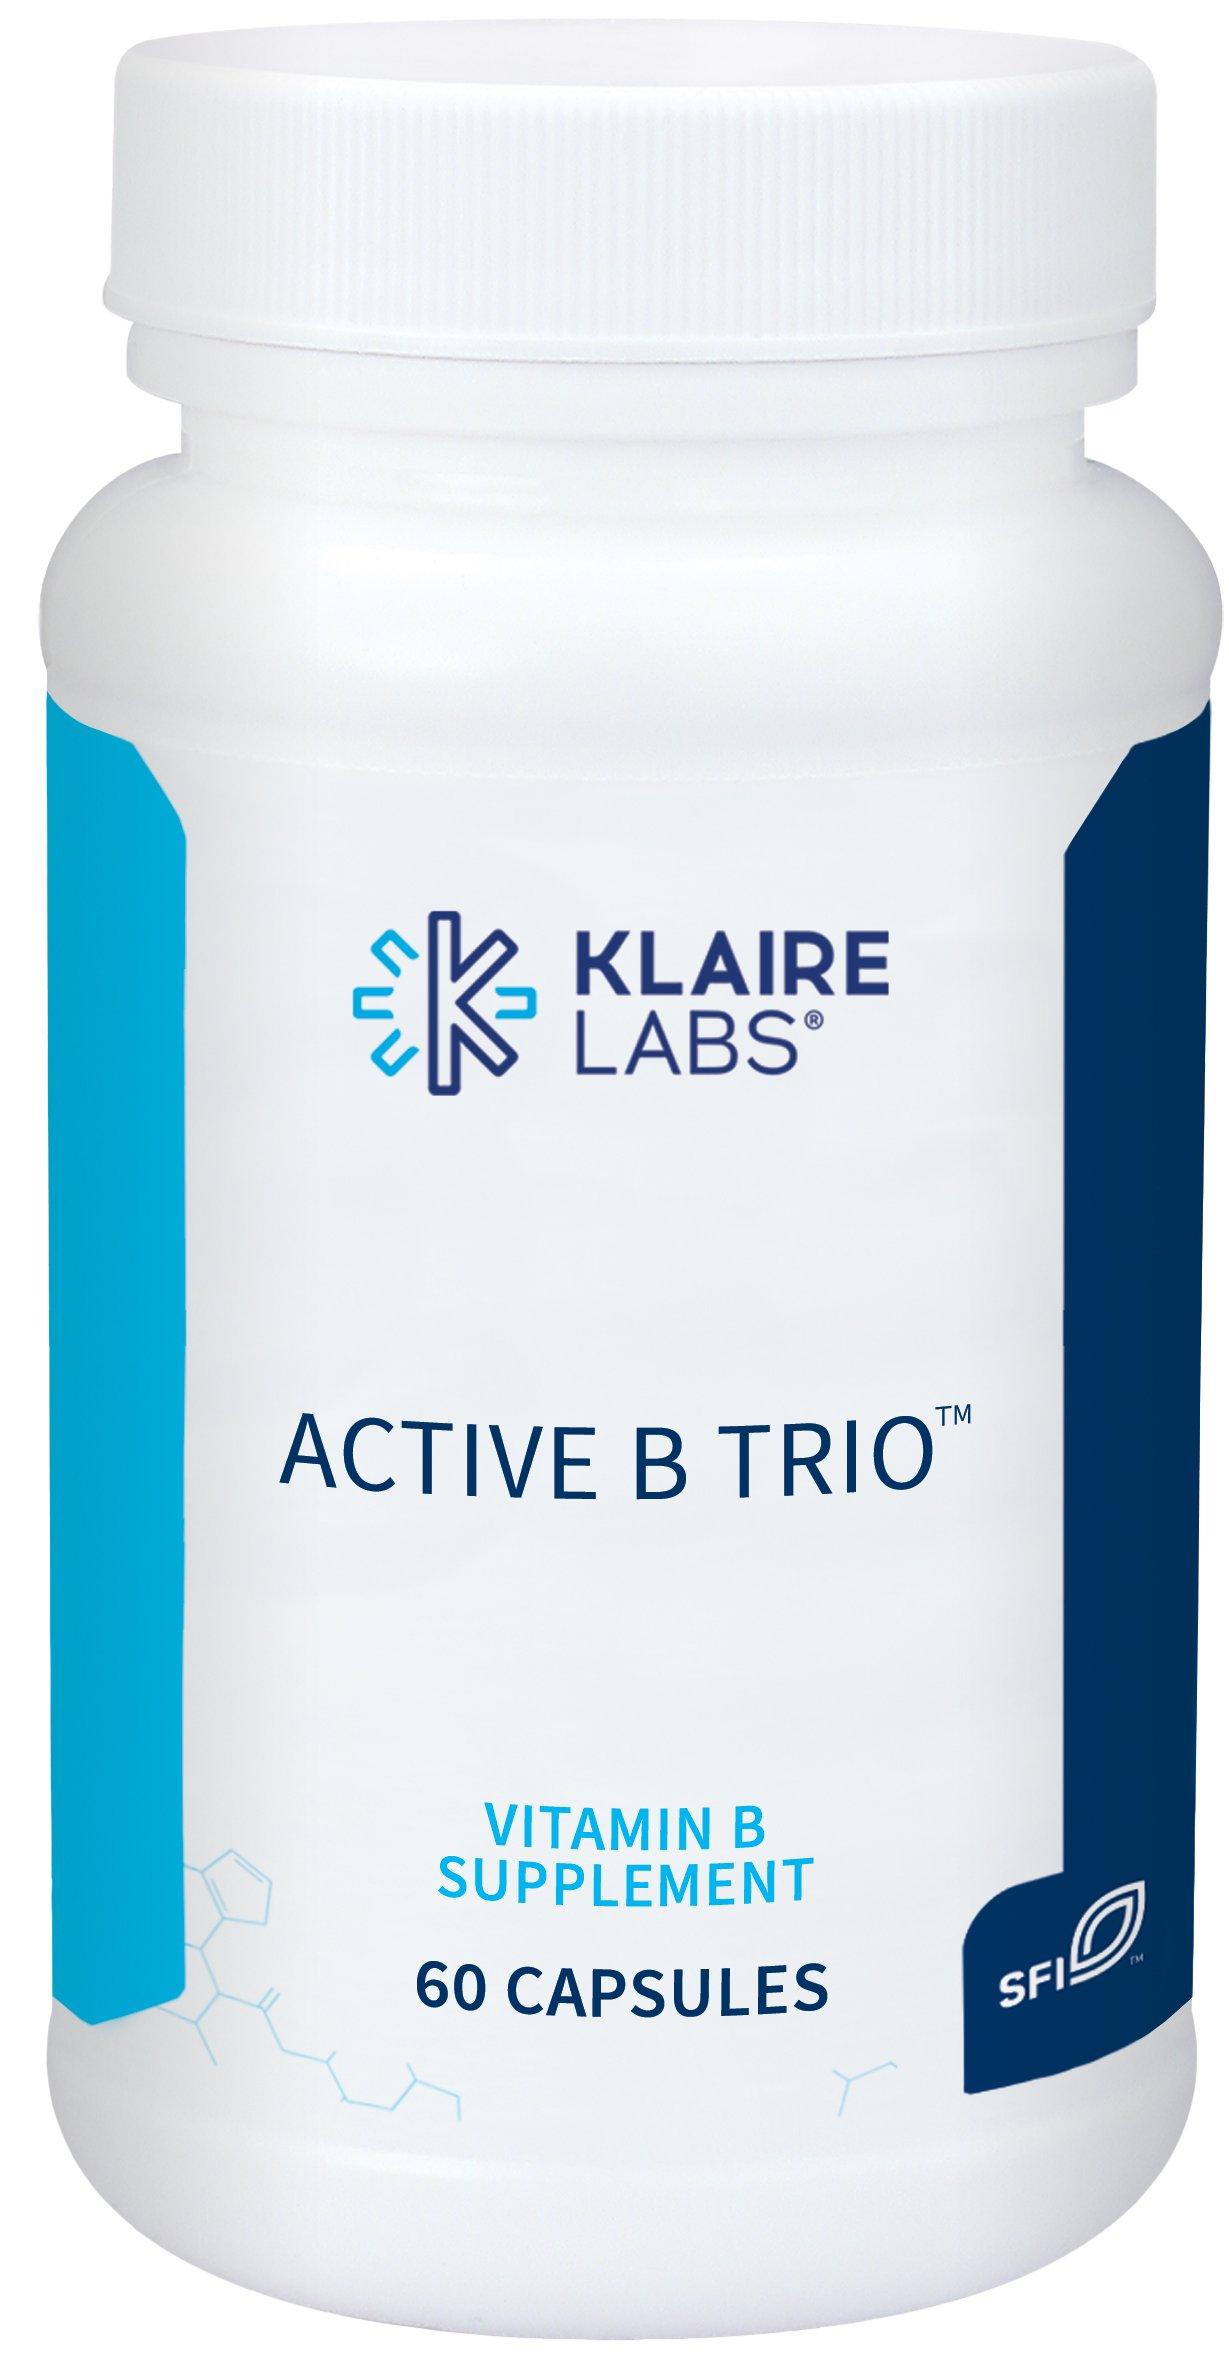 Klaire Labs Active B Trio - B12 as Methylcobalamin, Metafolin Folate L-5-MTHF & B6 as P-5-P in Small, Easy Swallow Pills (60 Capsules)